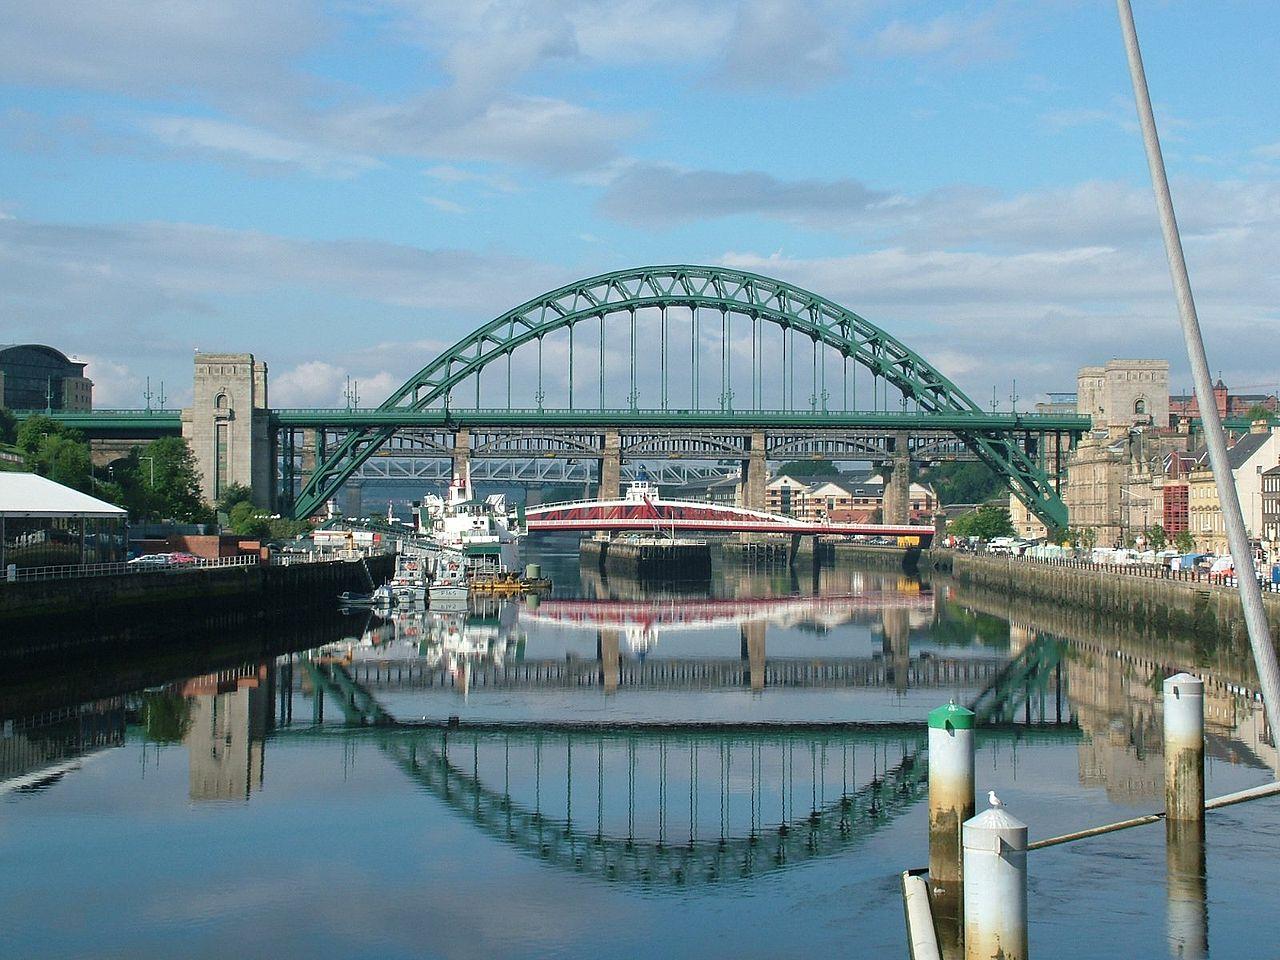 Tyne Bridge, in green, seen from the Gateshead Millennium Bridge